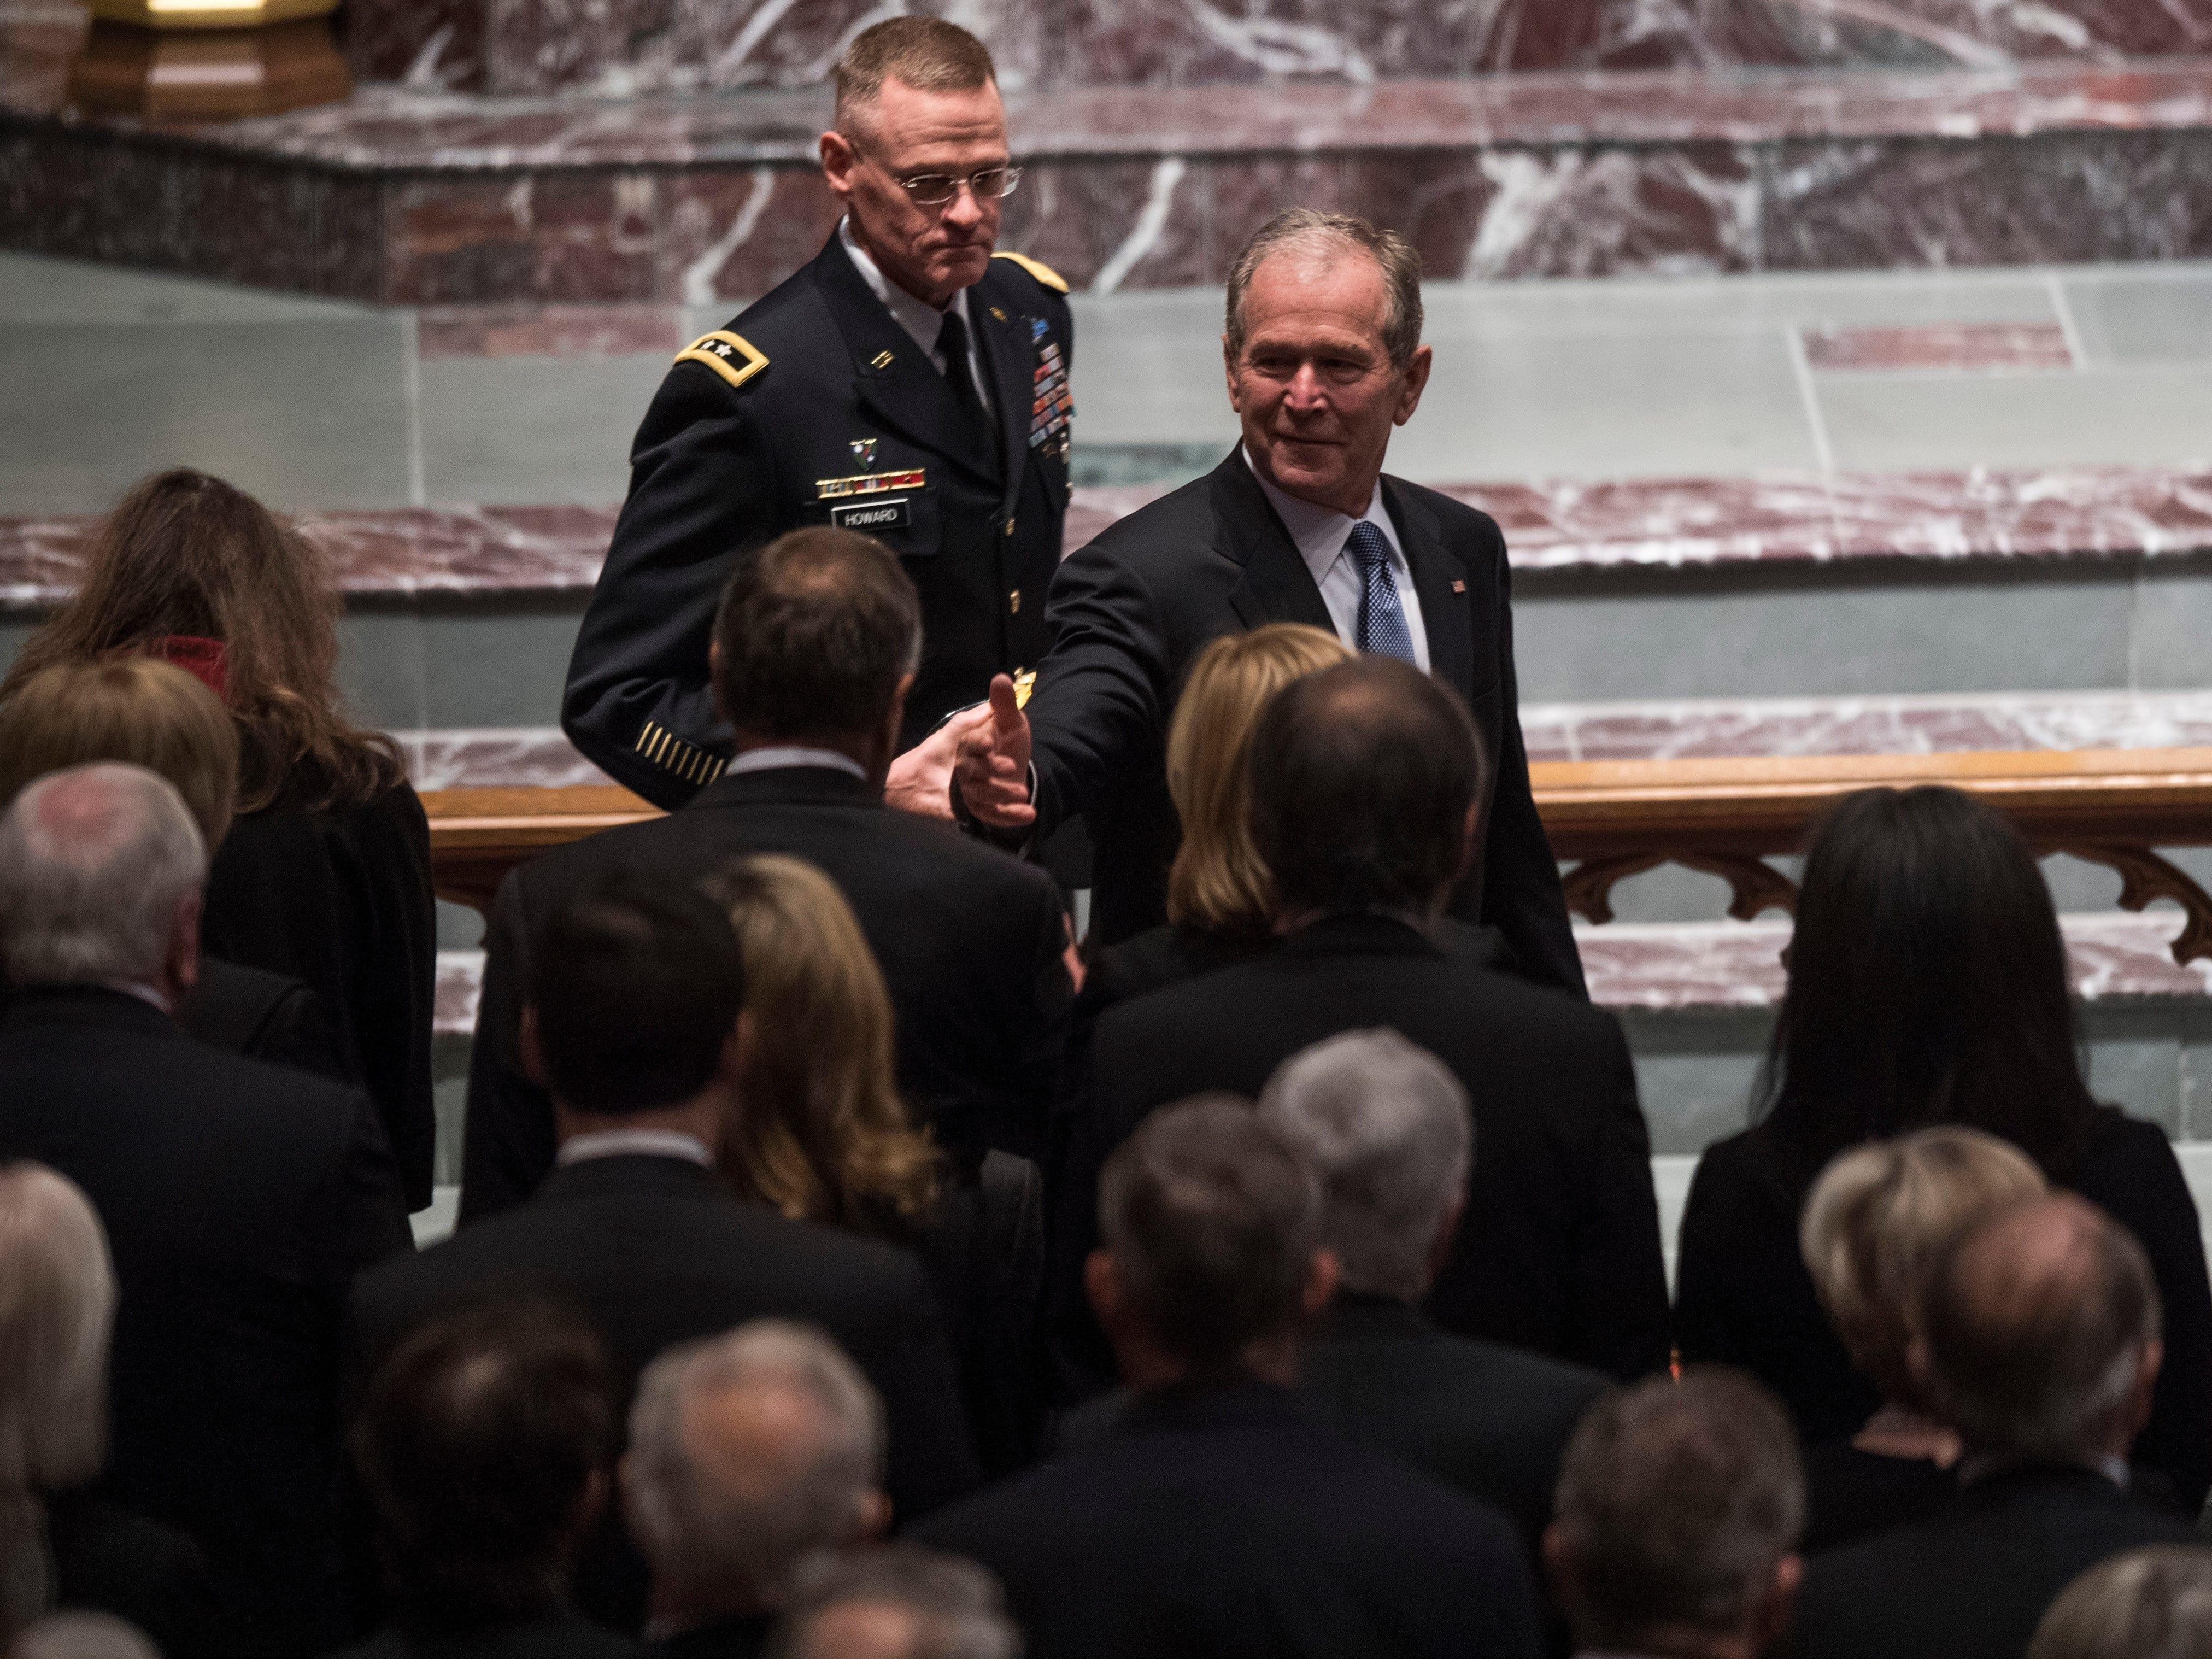 Former President George W. Bush arrives for the Funeral service for former President George H.W. Bush at St. Martin's Episcopal Church in Houston, Thursday, Dec. 6, 2018.